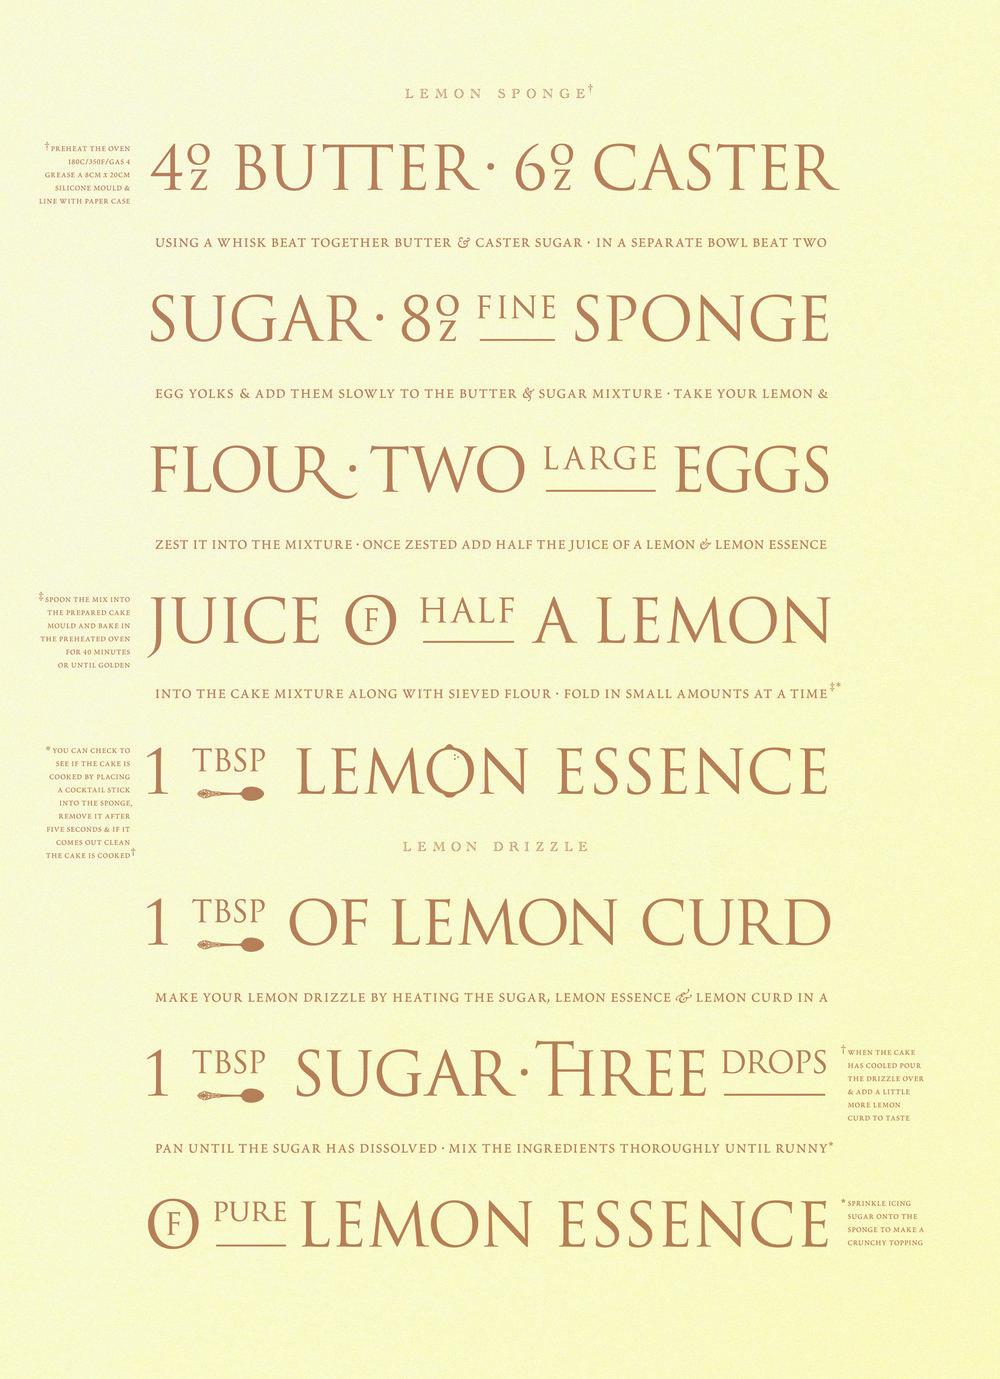 The recipe for his Grannies Lemon Sponge.